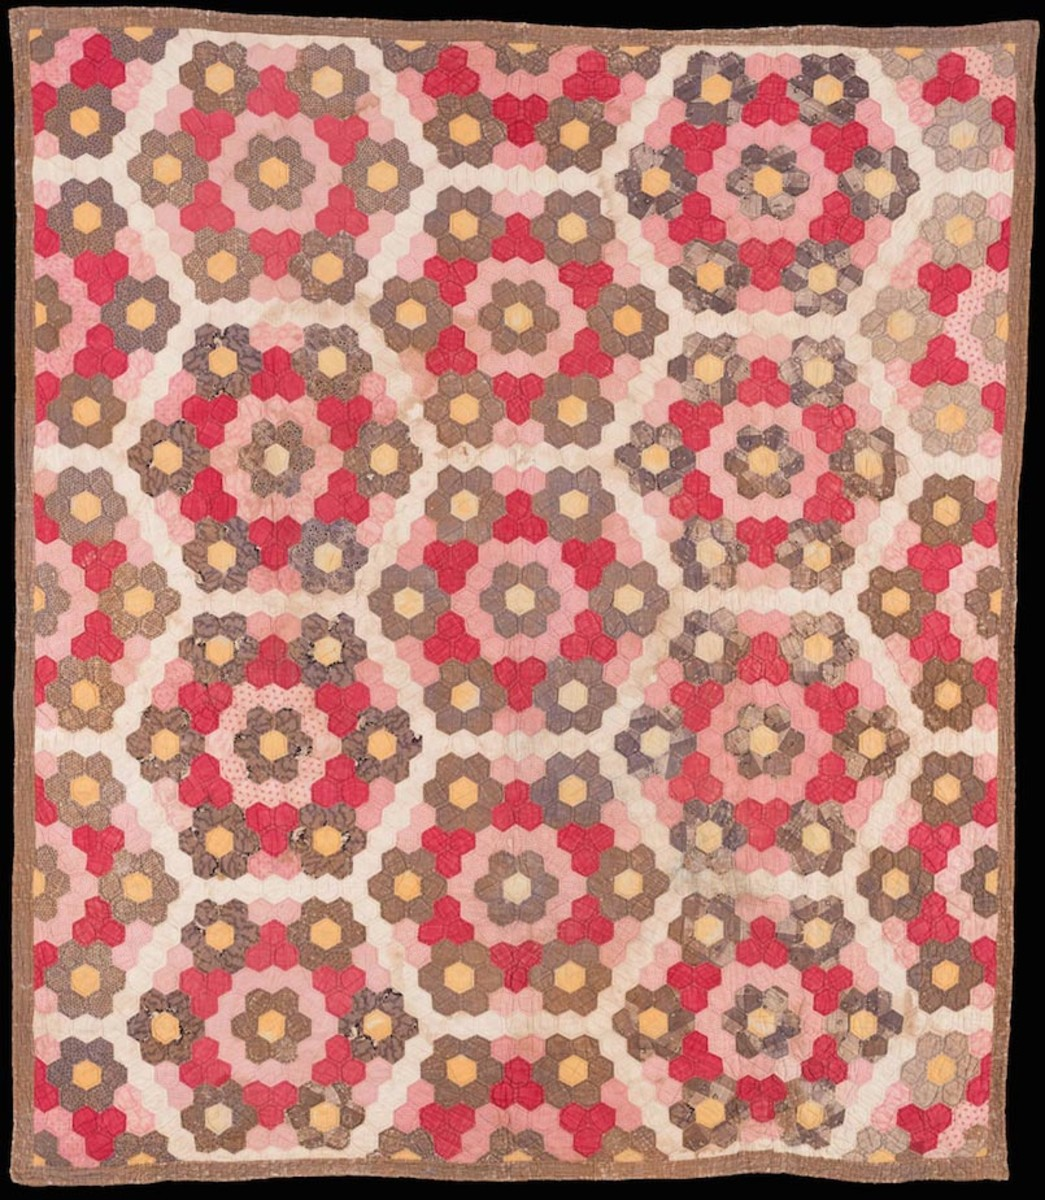 Pieced Honeycomb quilt